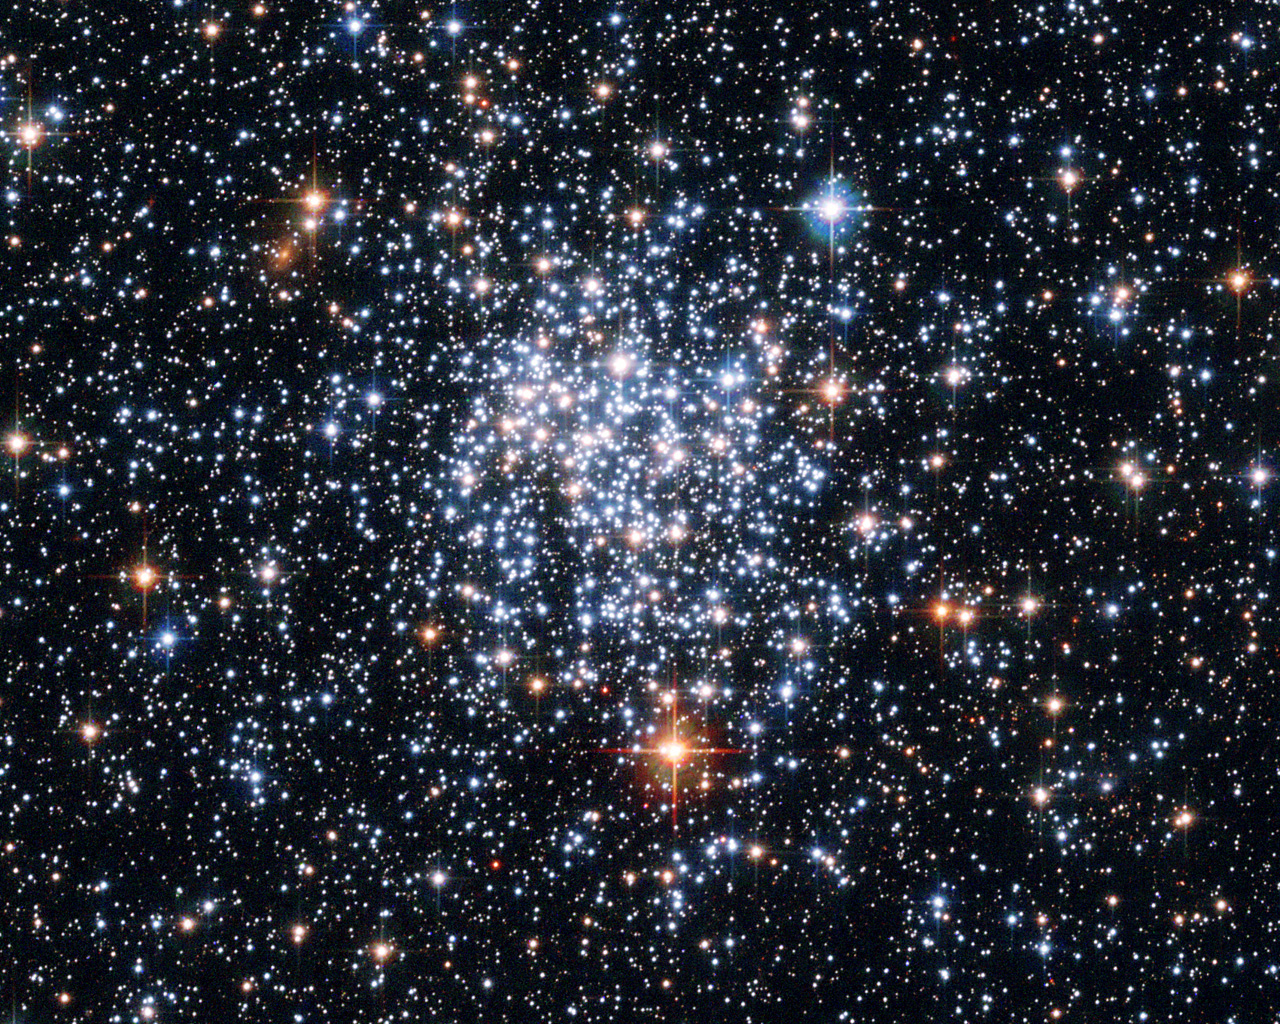 Star Cluster Wallpaper 1.1 mb